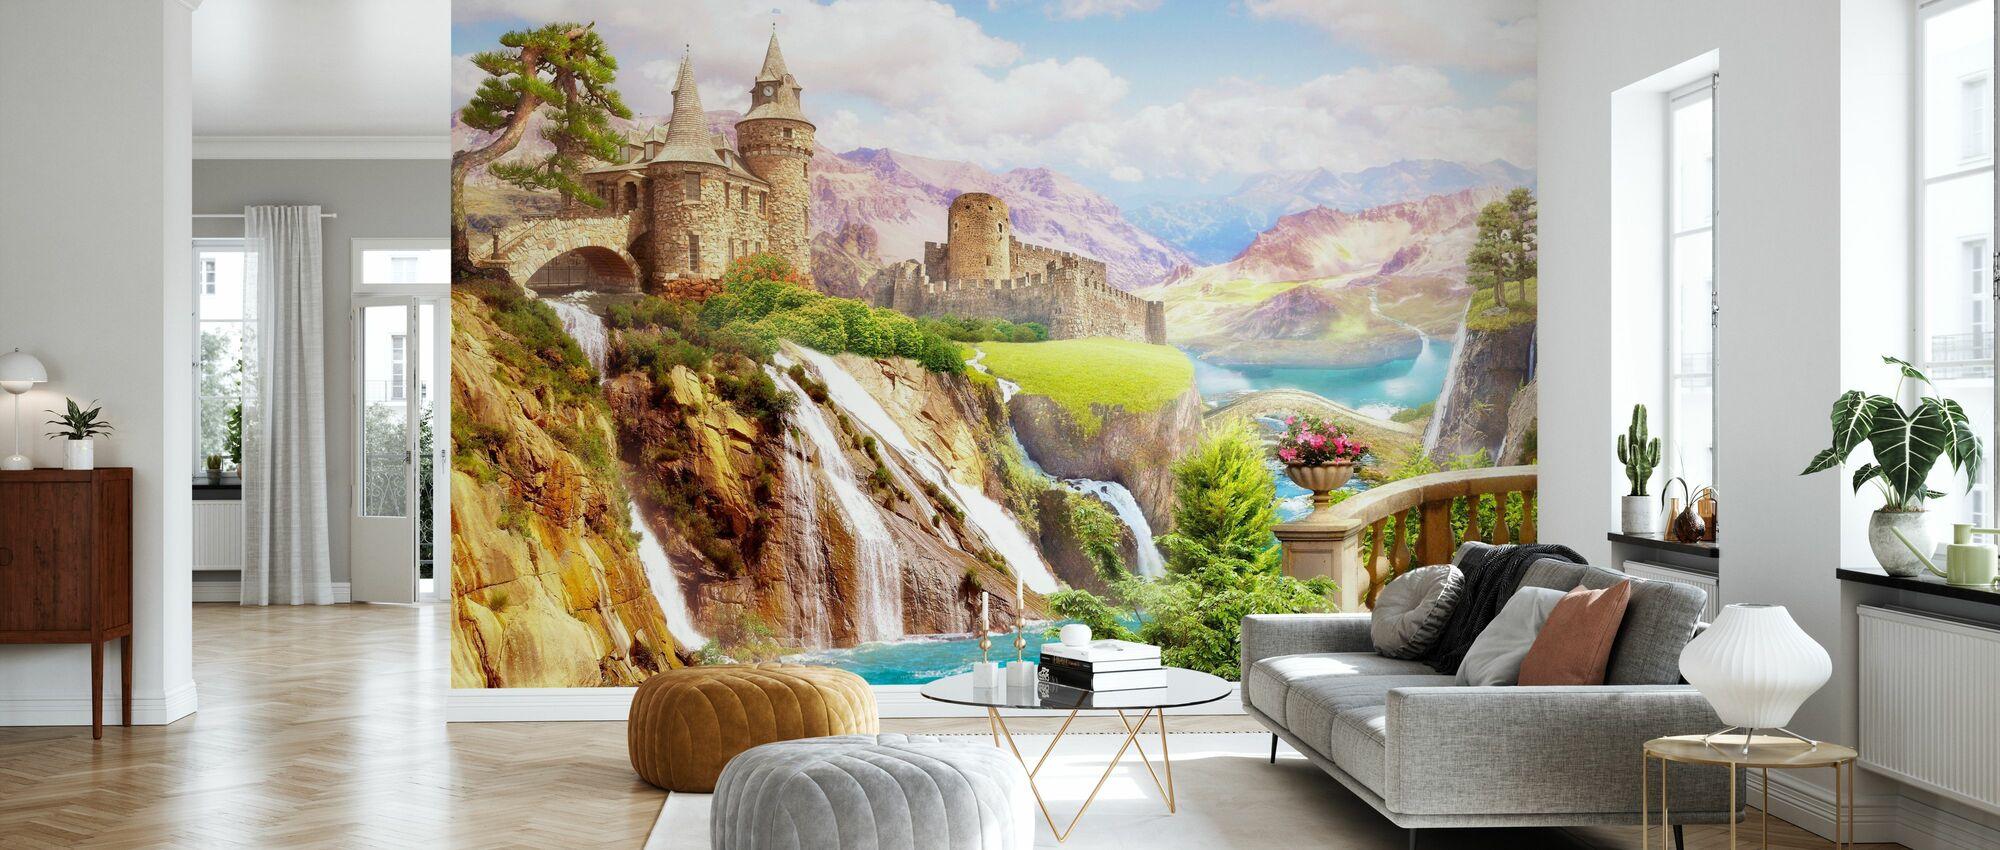 Castles - Wallpaper - Living Room